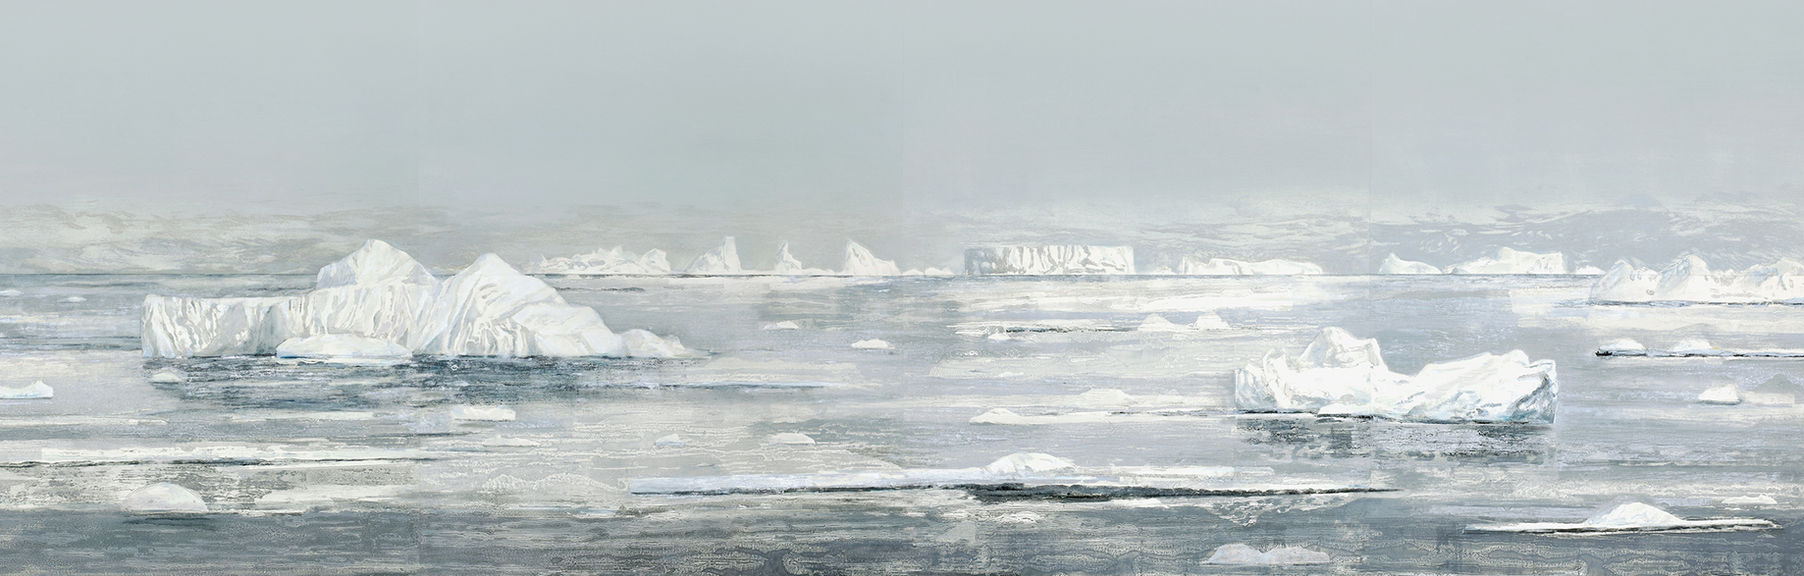 SOFT ICE - 120 x 398 cm